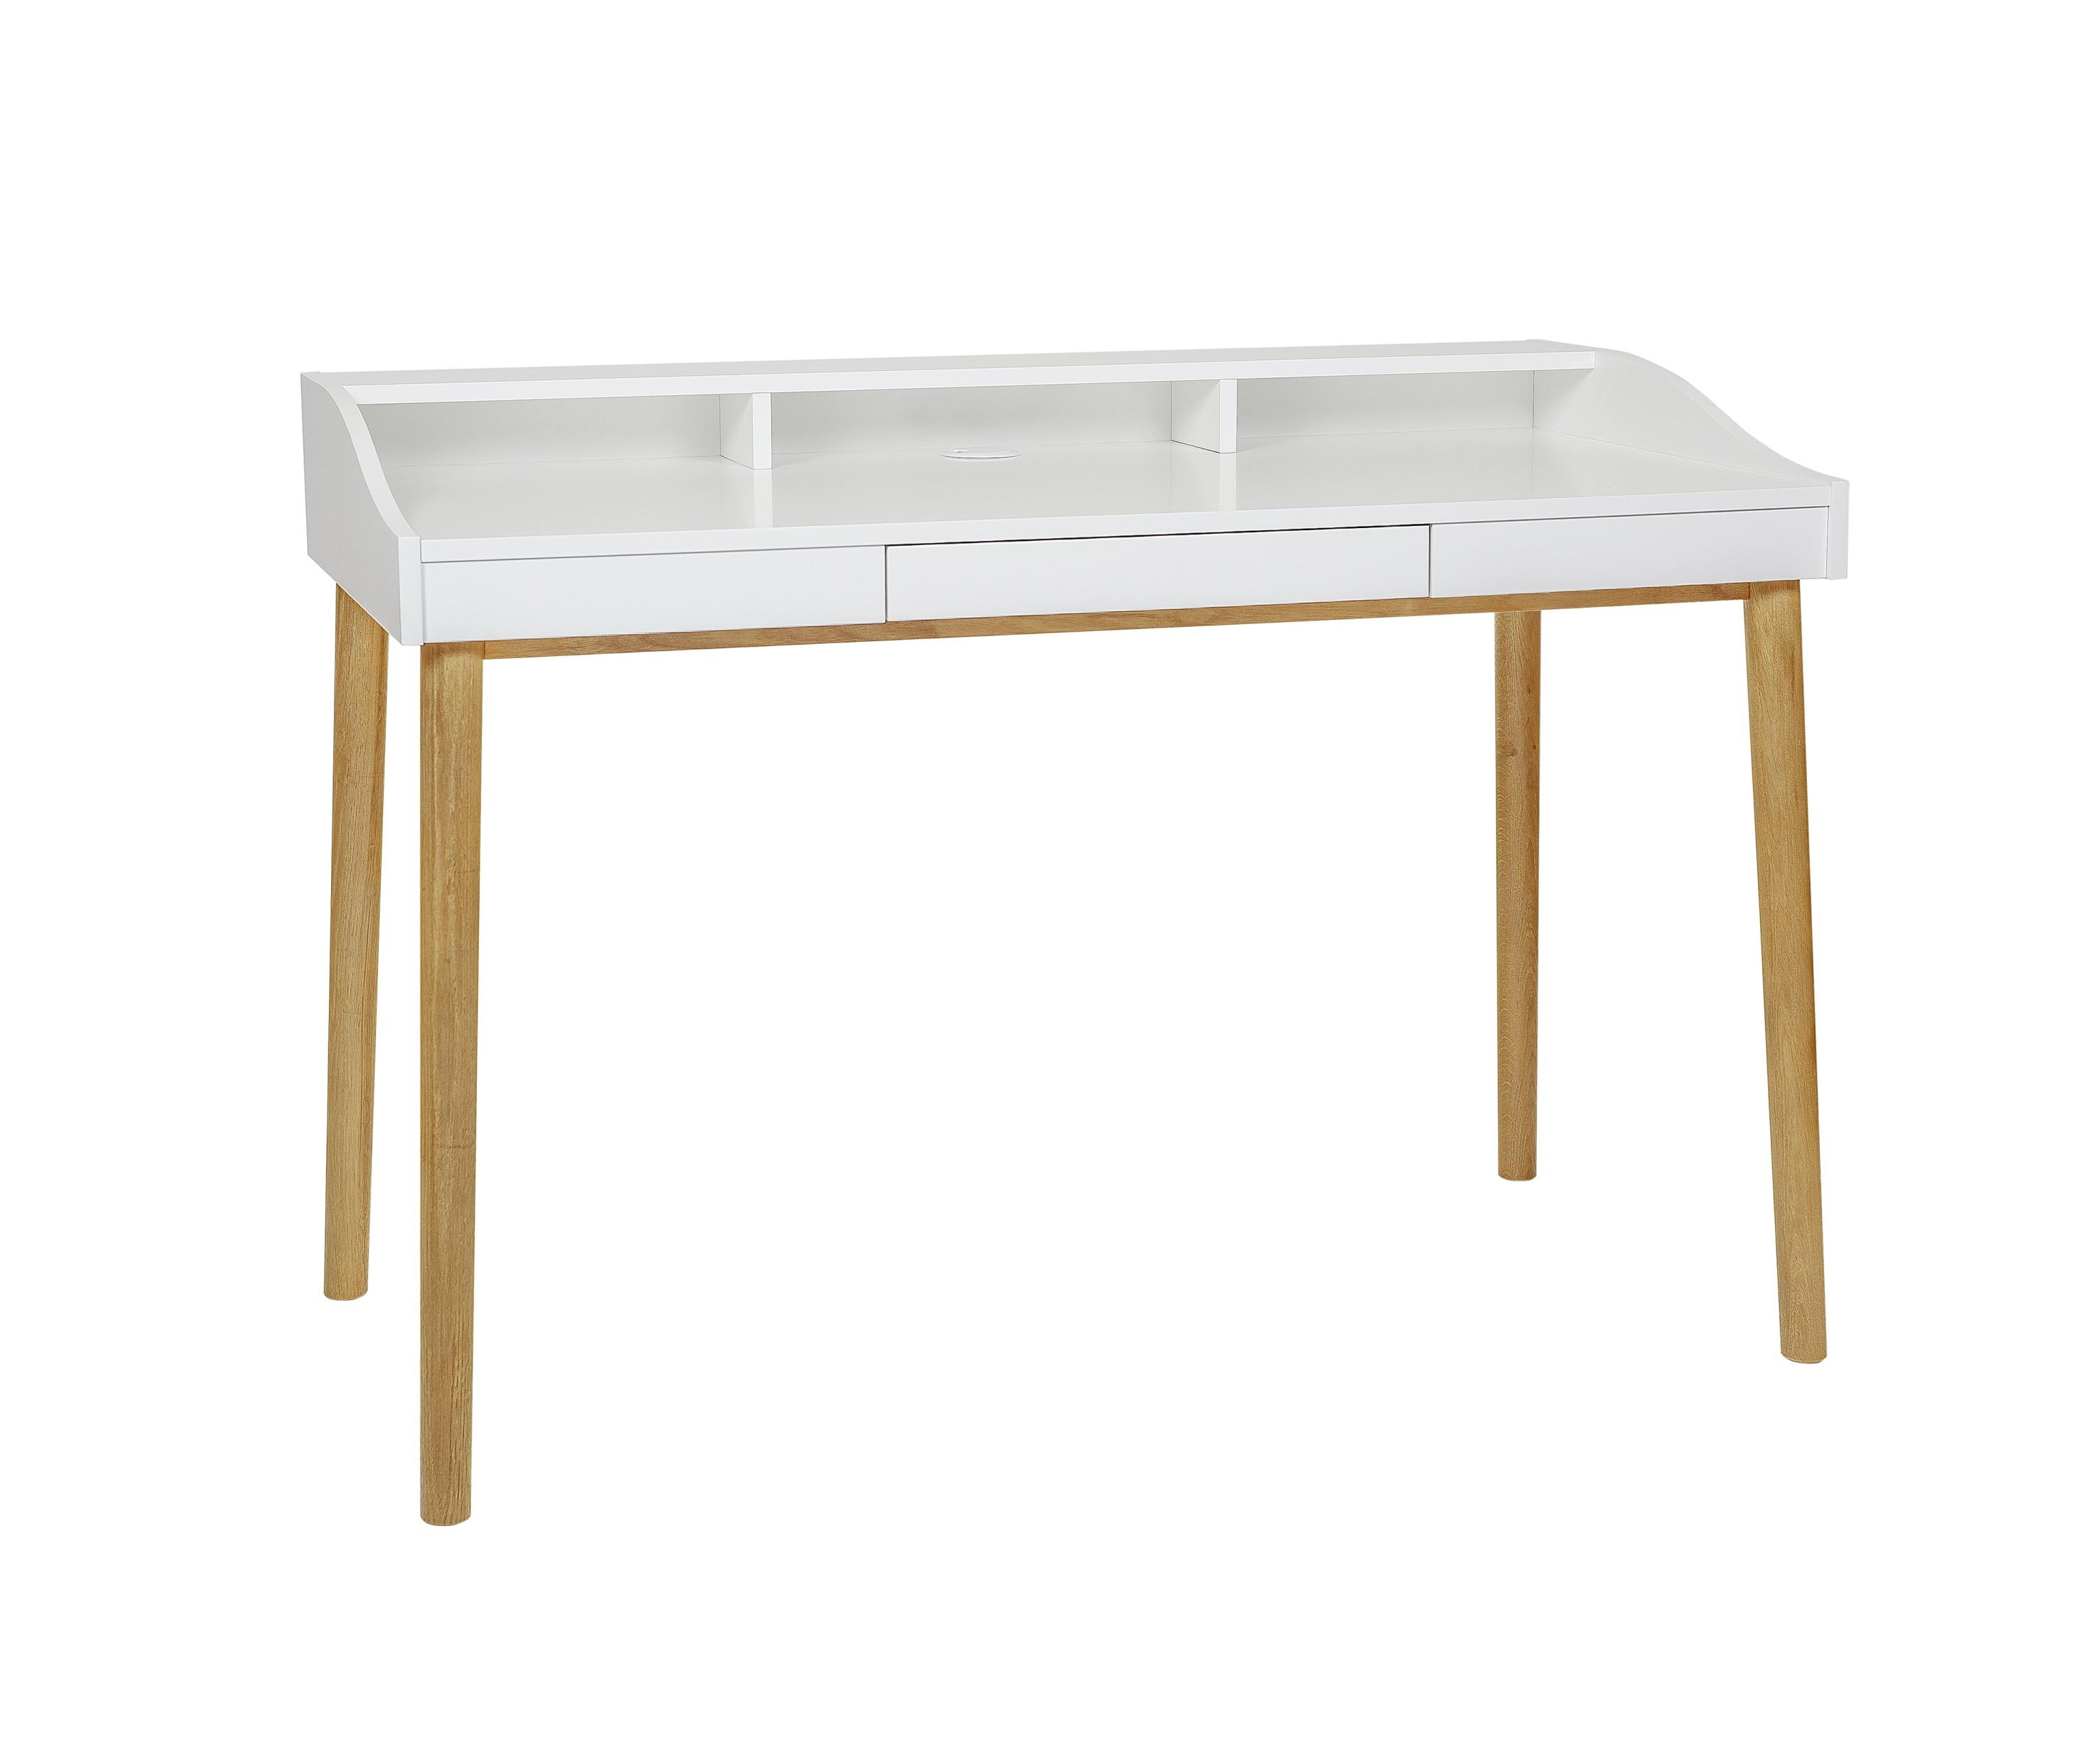 191003008014 Lindenhof Desk 01